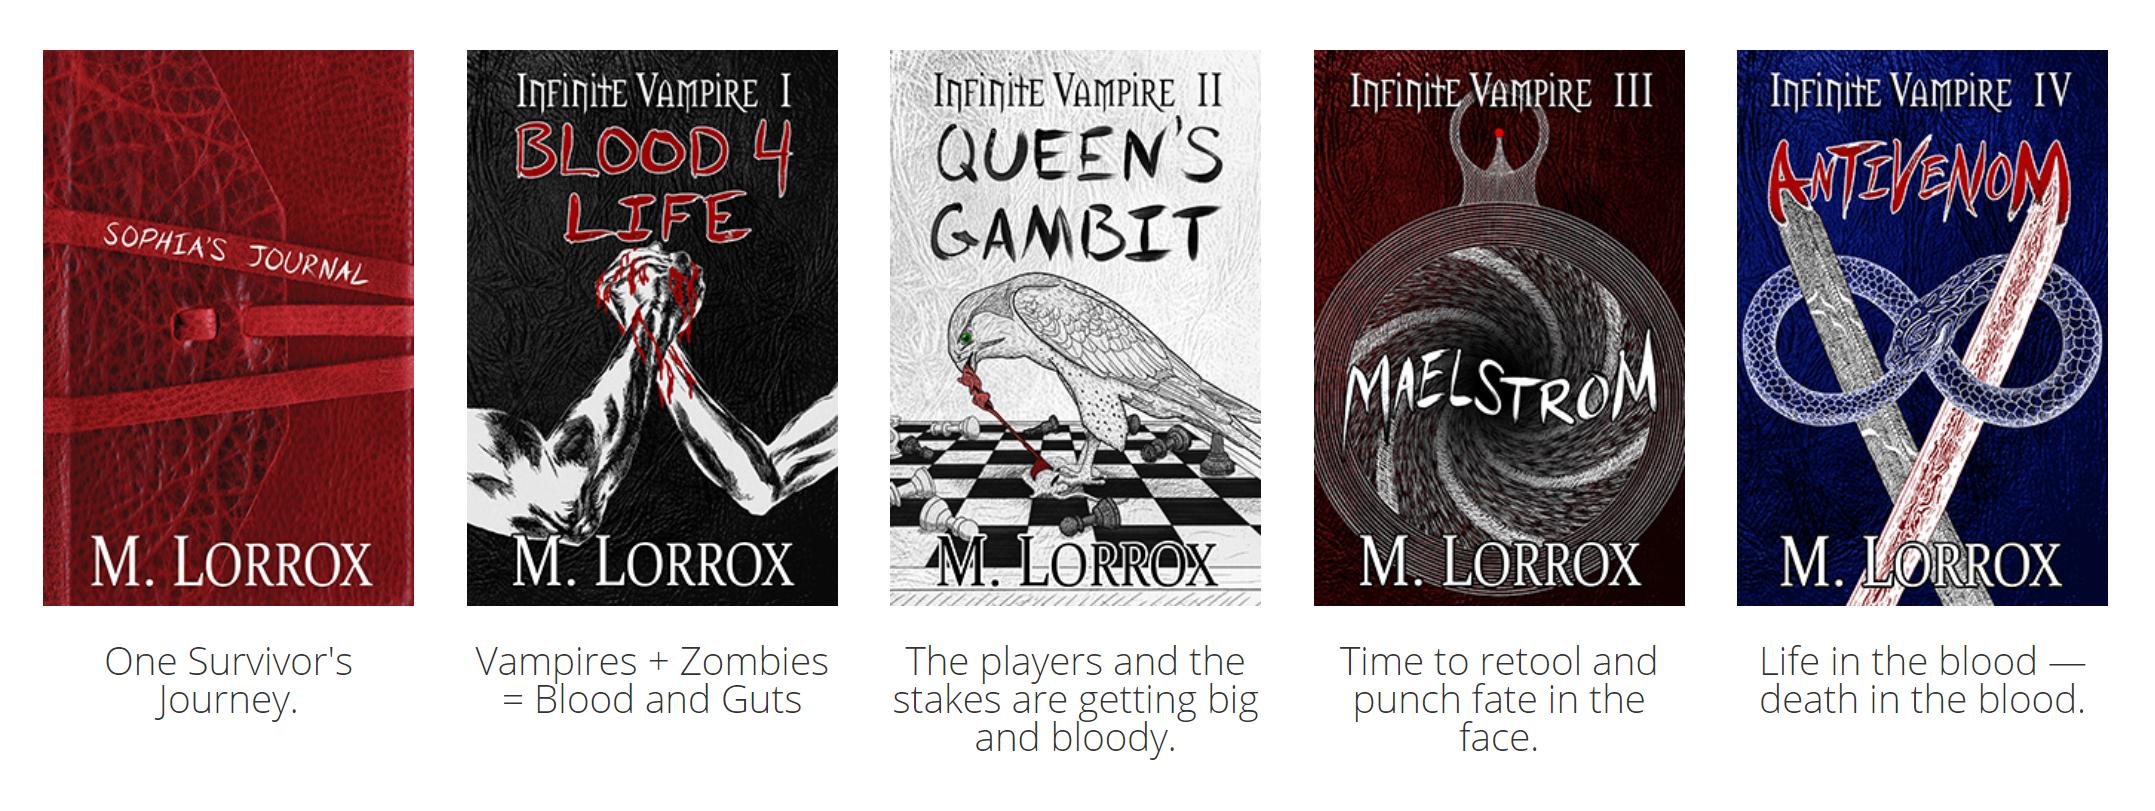 Infinite Vampire book covers